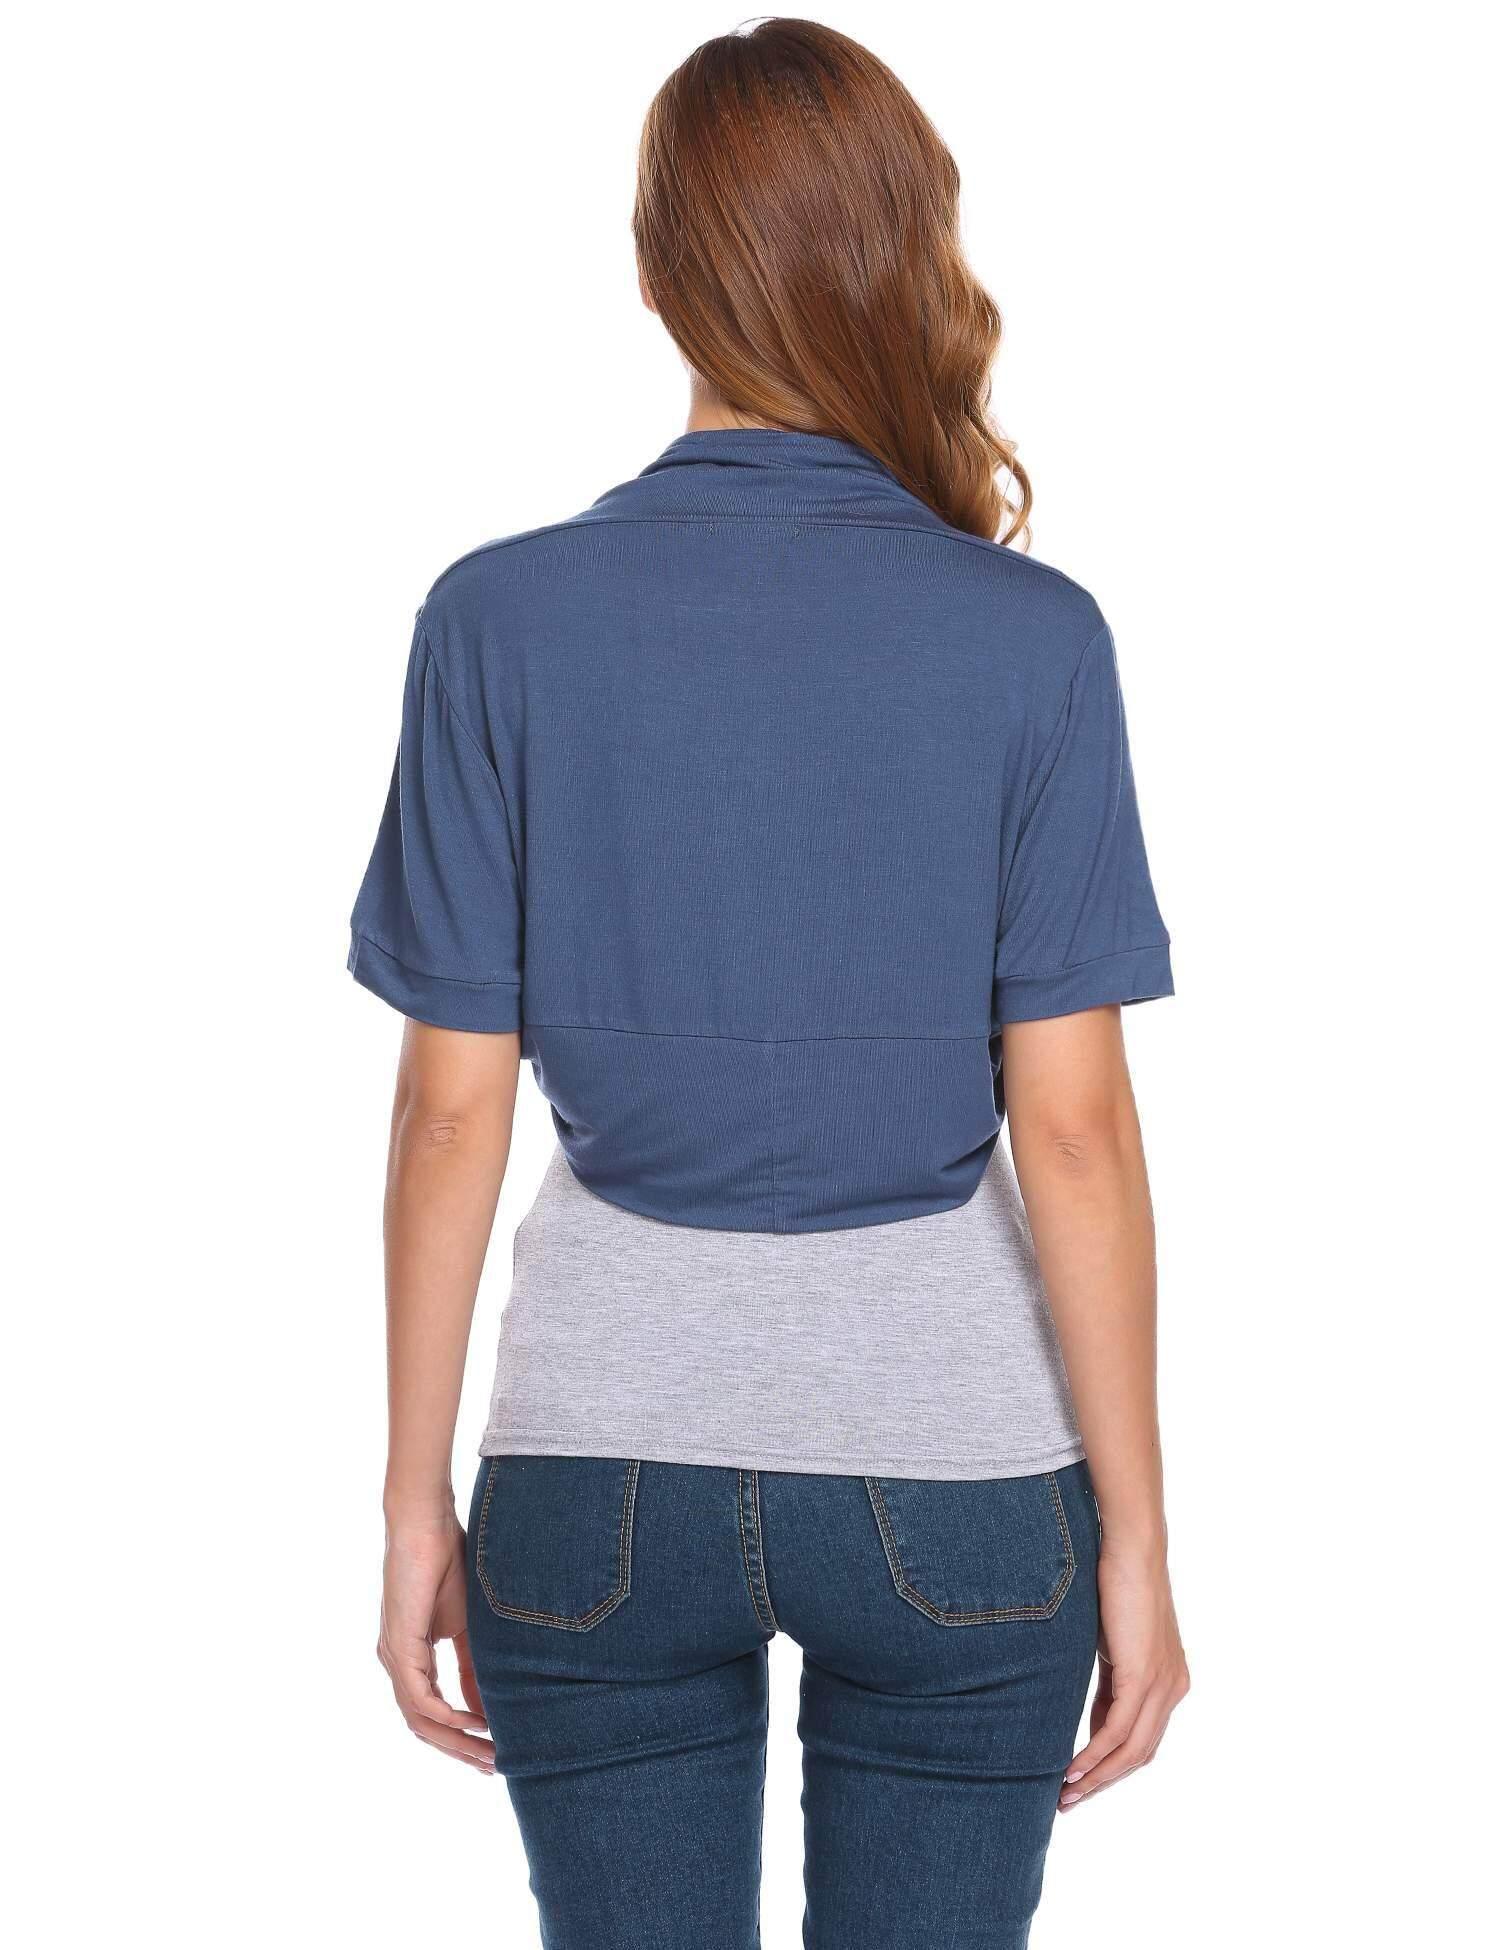 Kemura Kemeja Pria Navy Short Sleeve Daftar Harga Terkini dan Source · SuperCart Women Casual Short